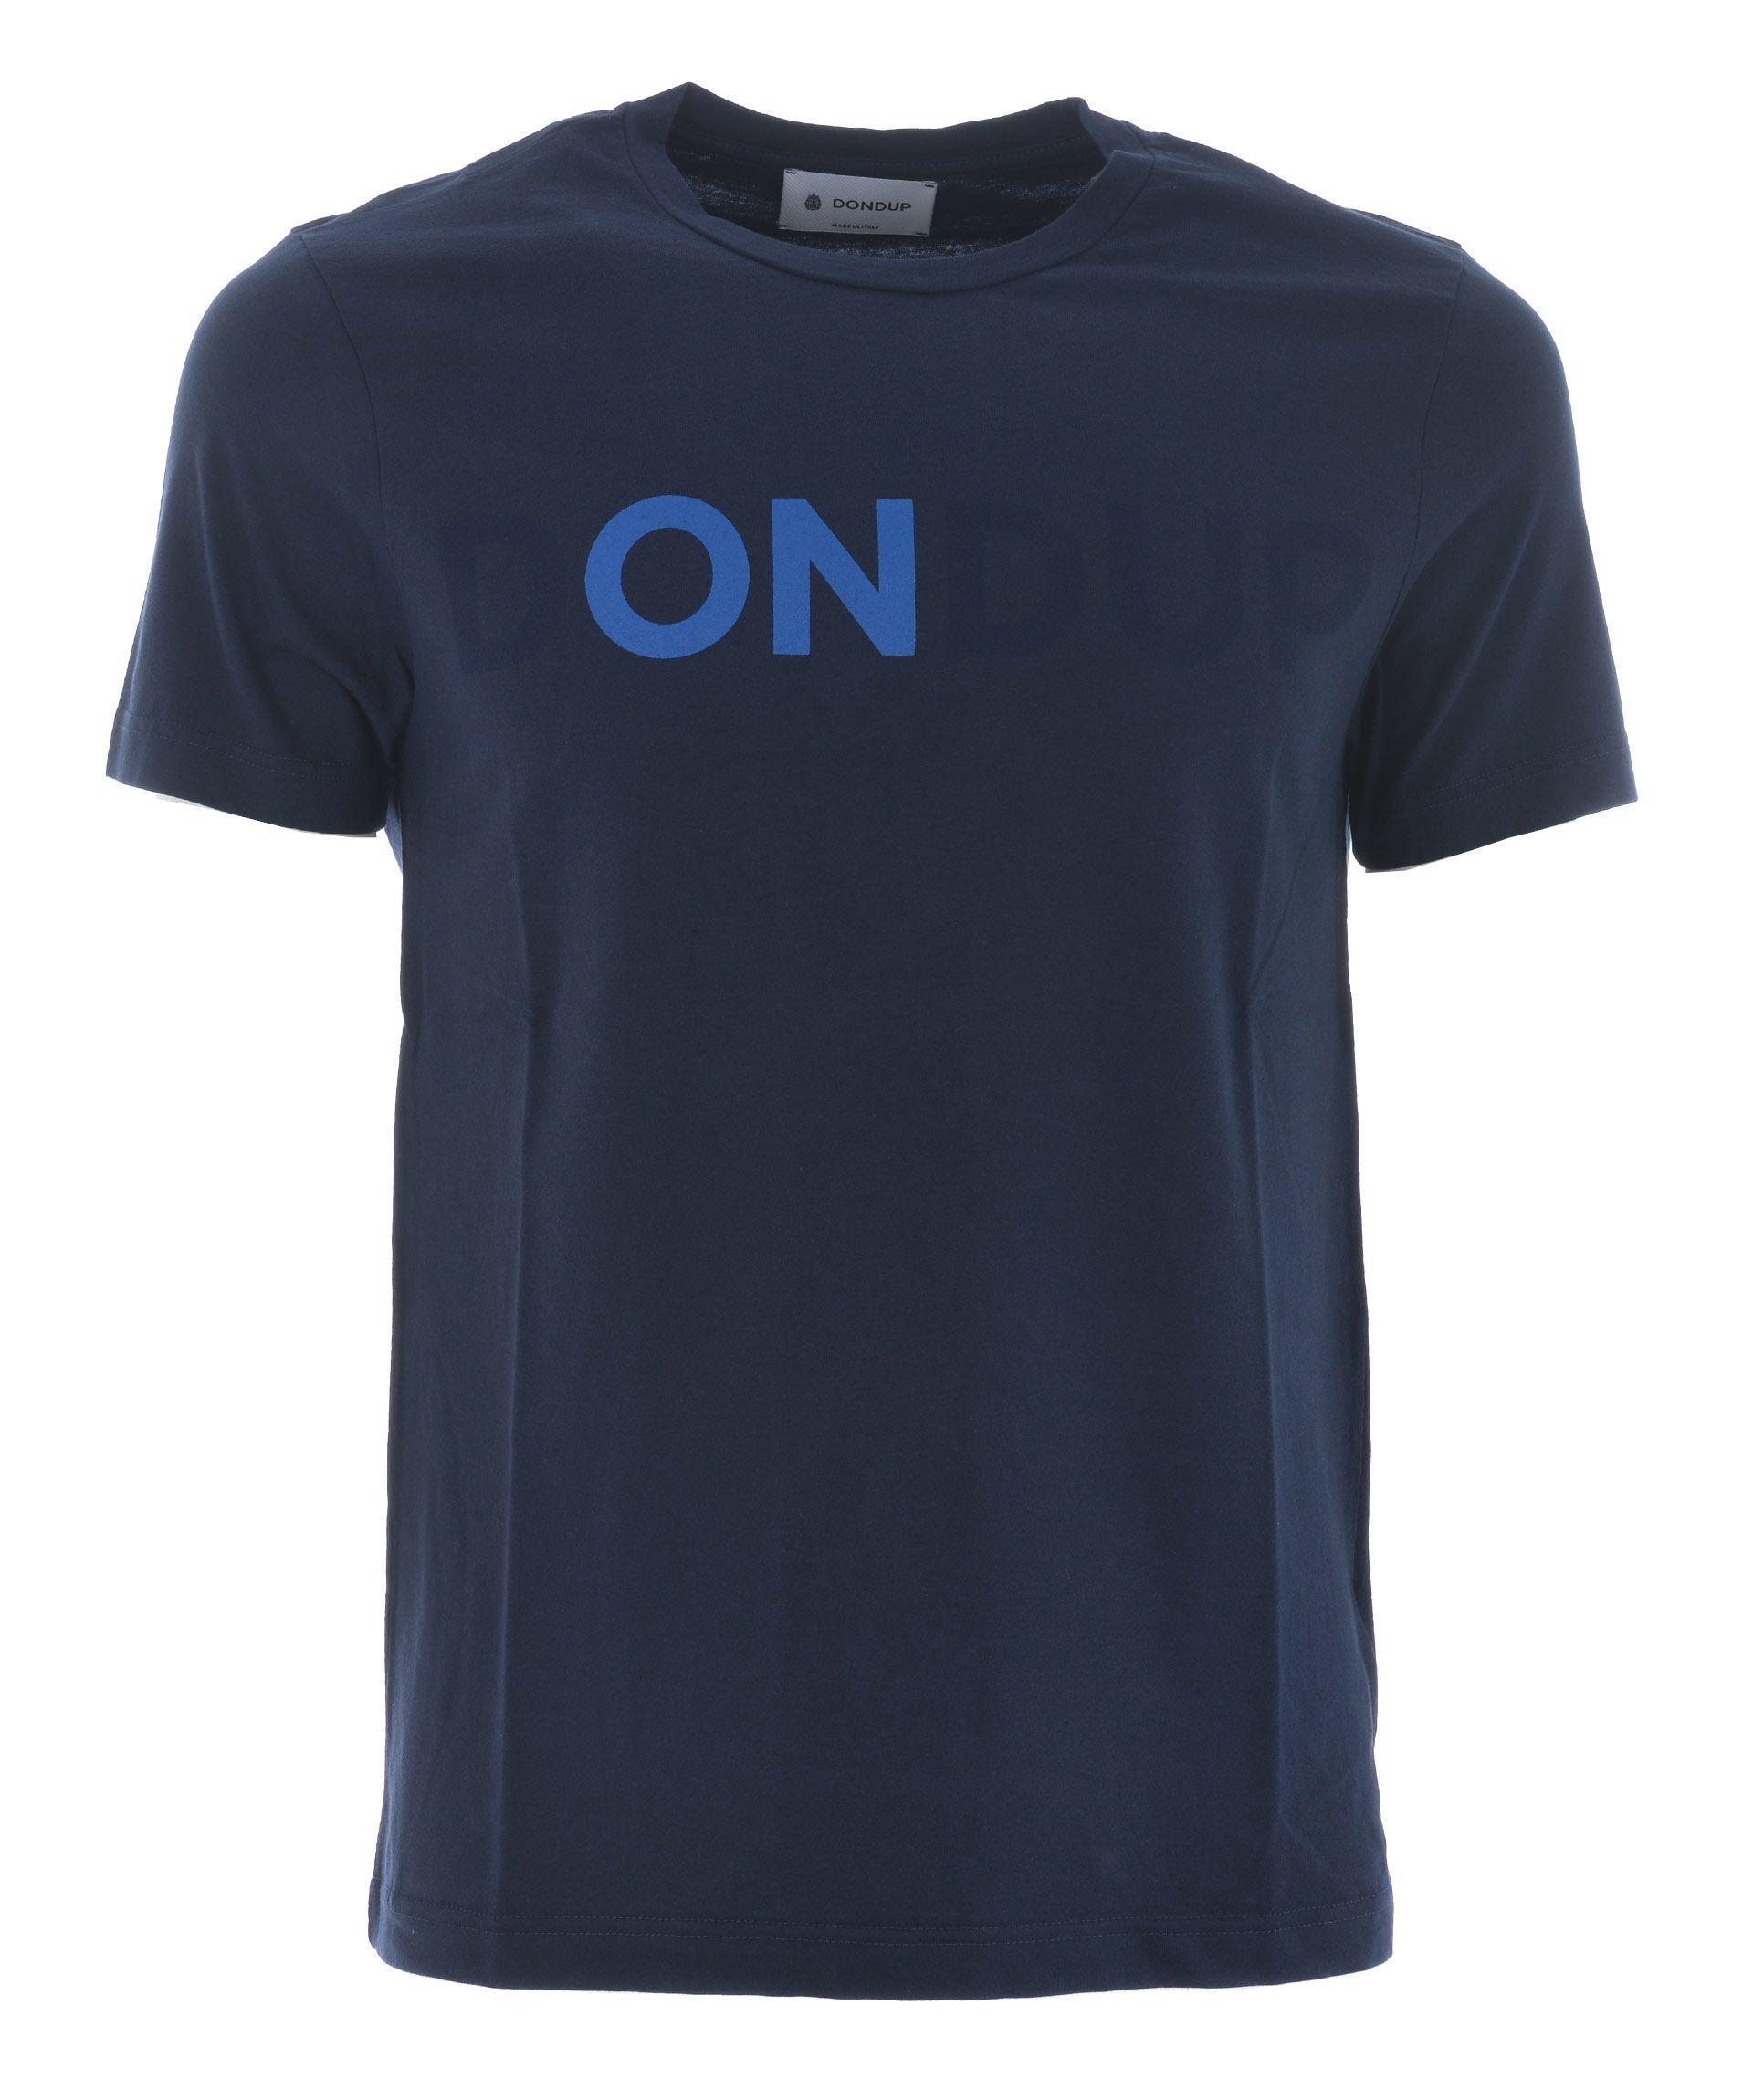 Dondup Logo Print T-Shirt In Blu Scuro